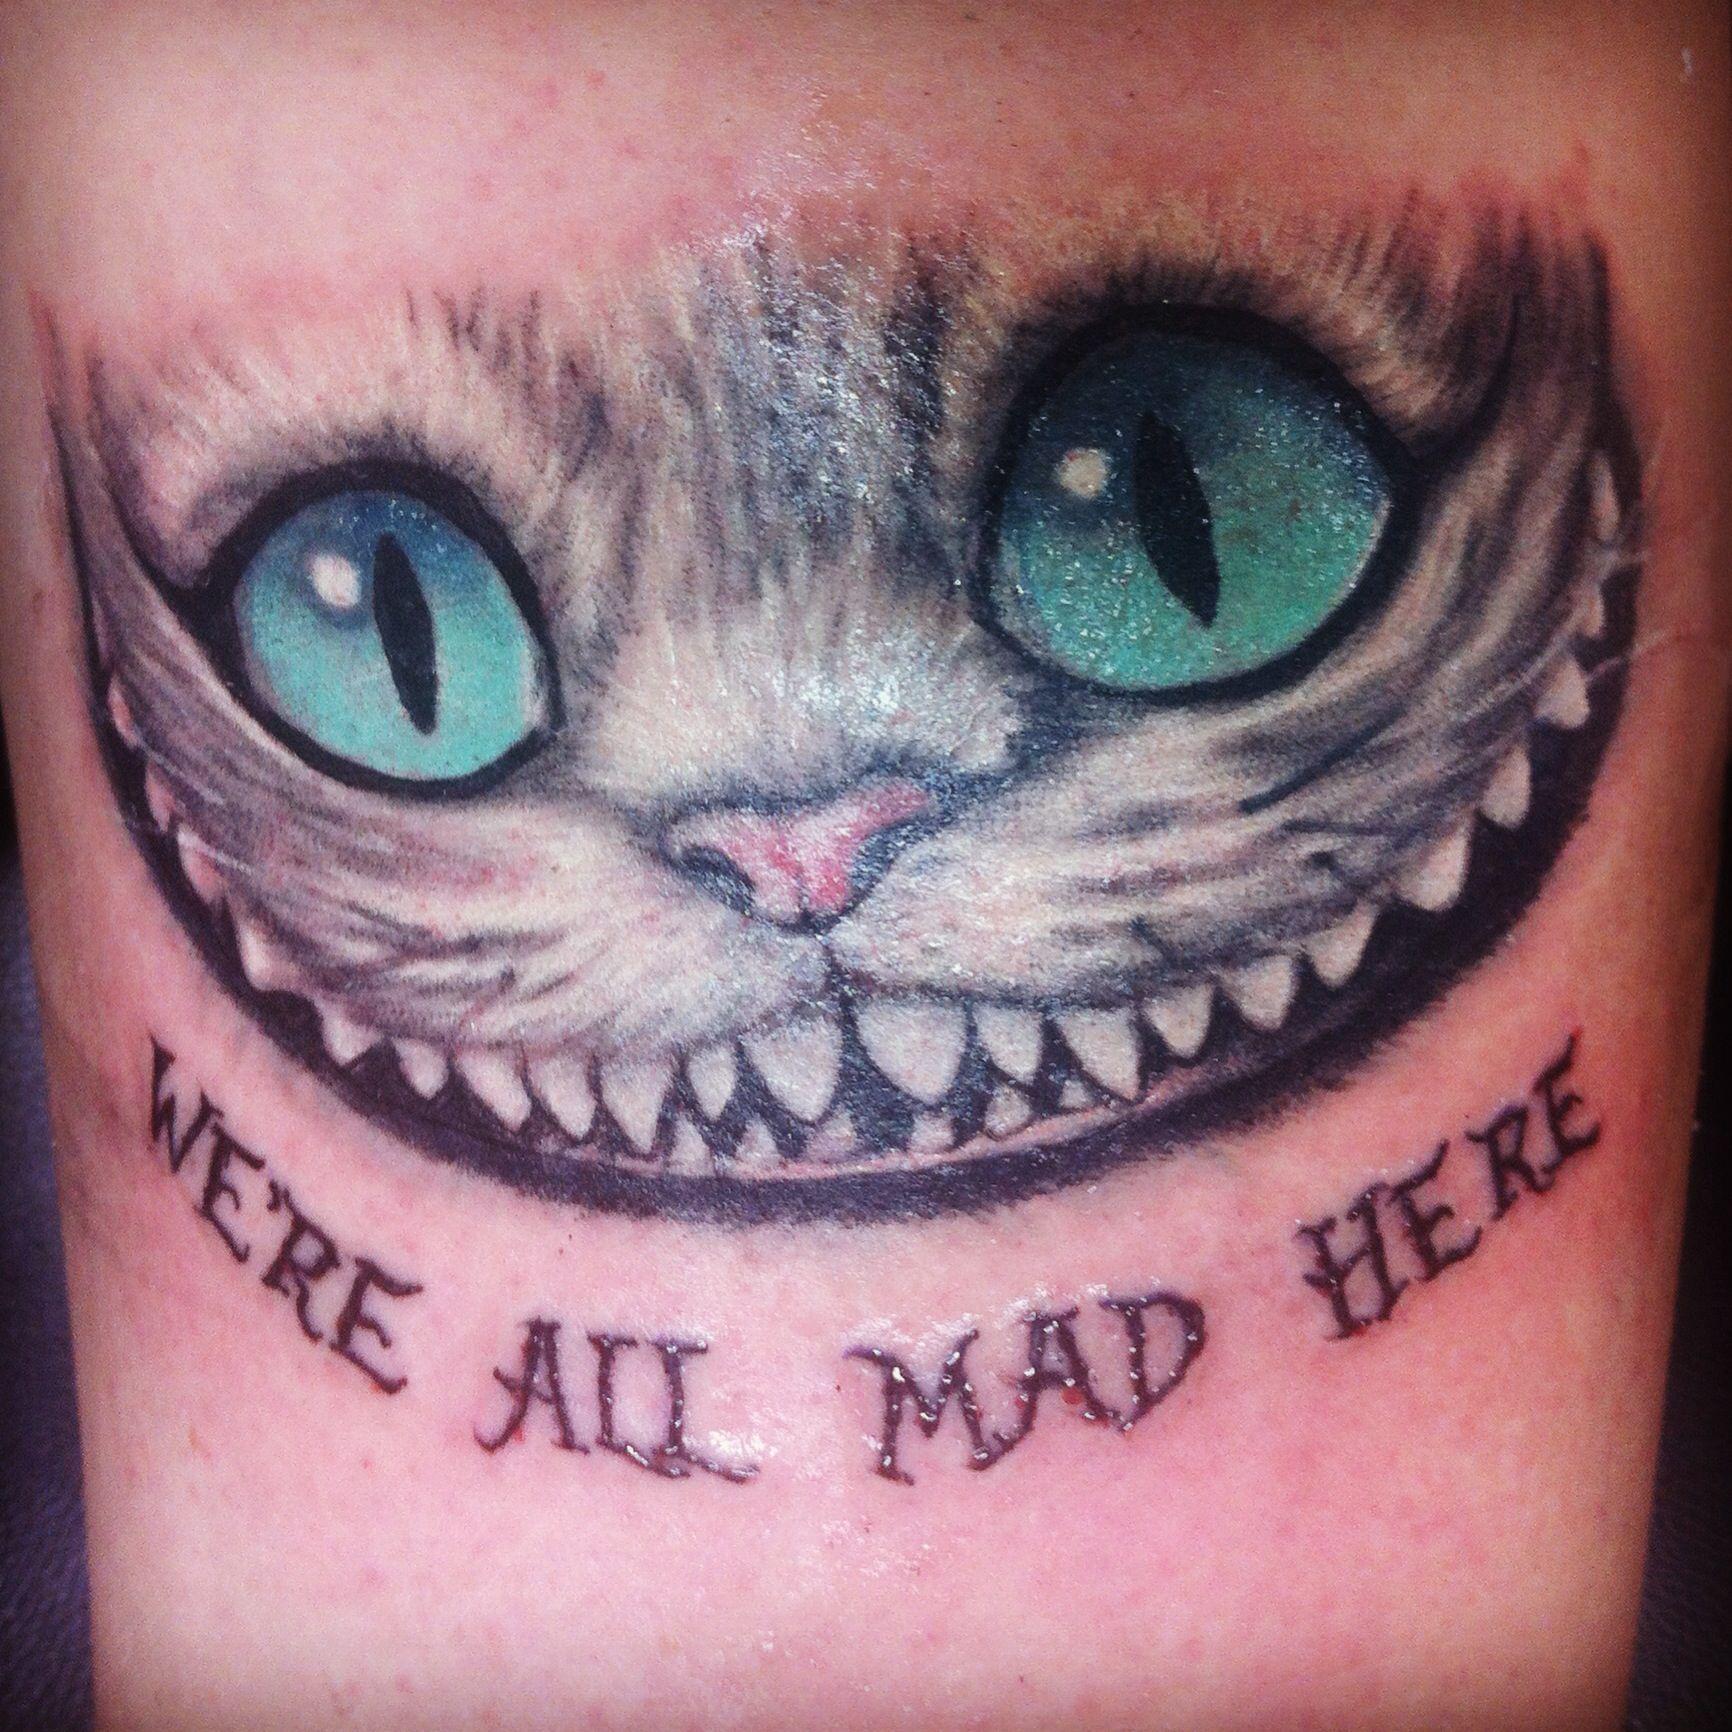 My New Tattoo Cheshire Cat From Tim Burton S Alice In Wonderland We Re All Mad Here Cheshire Cat Tattoo Tattoos Wonderland Tattoo